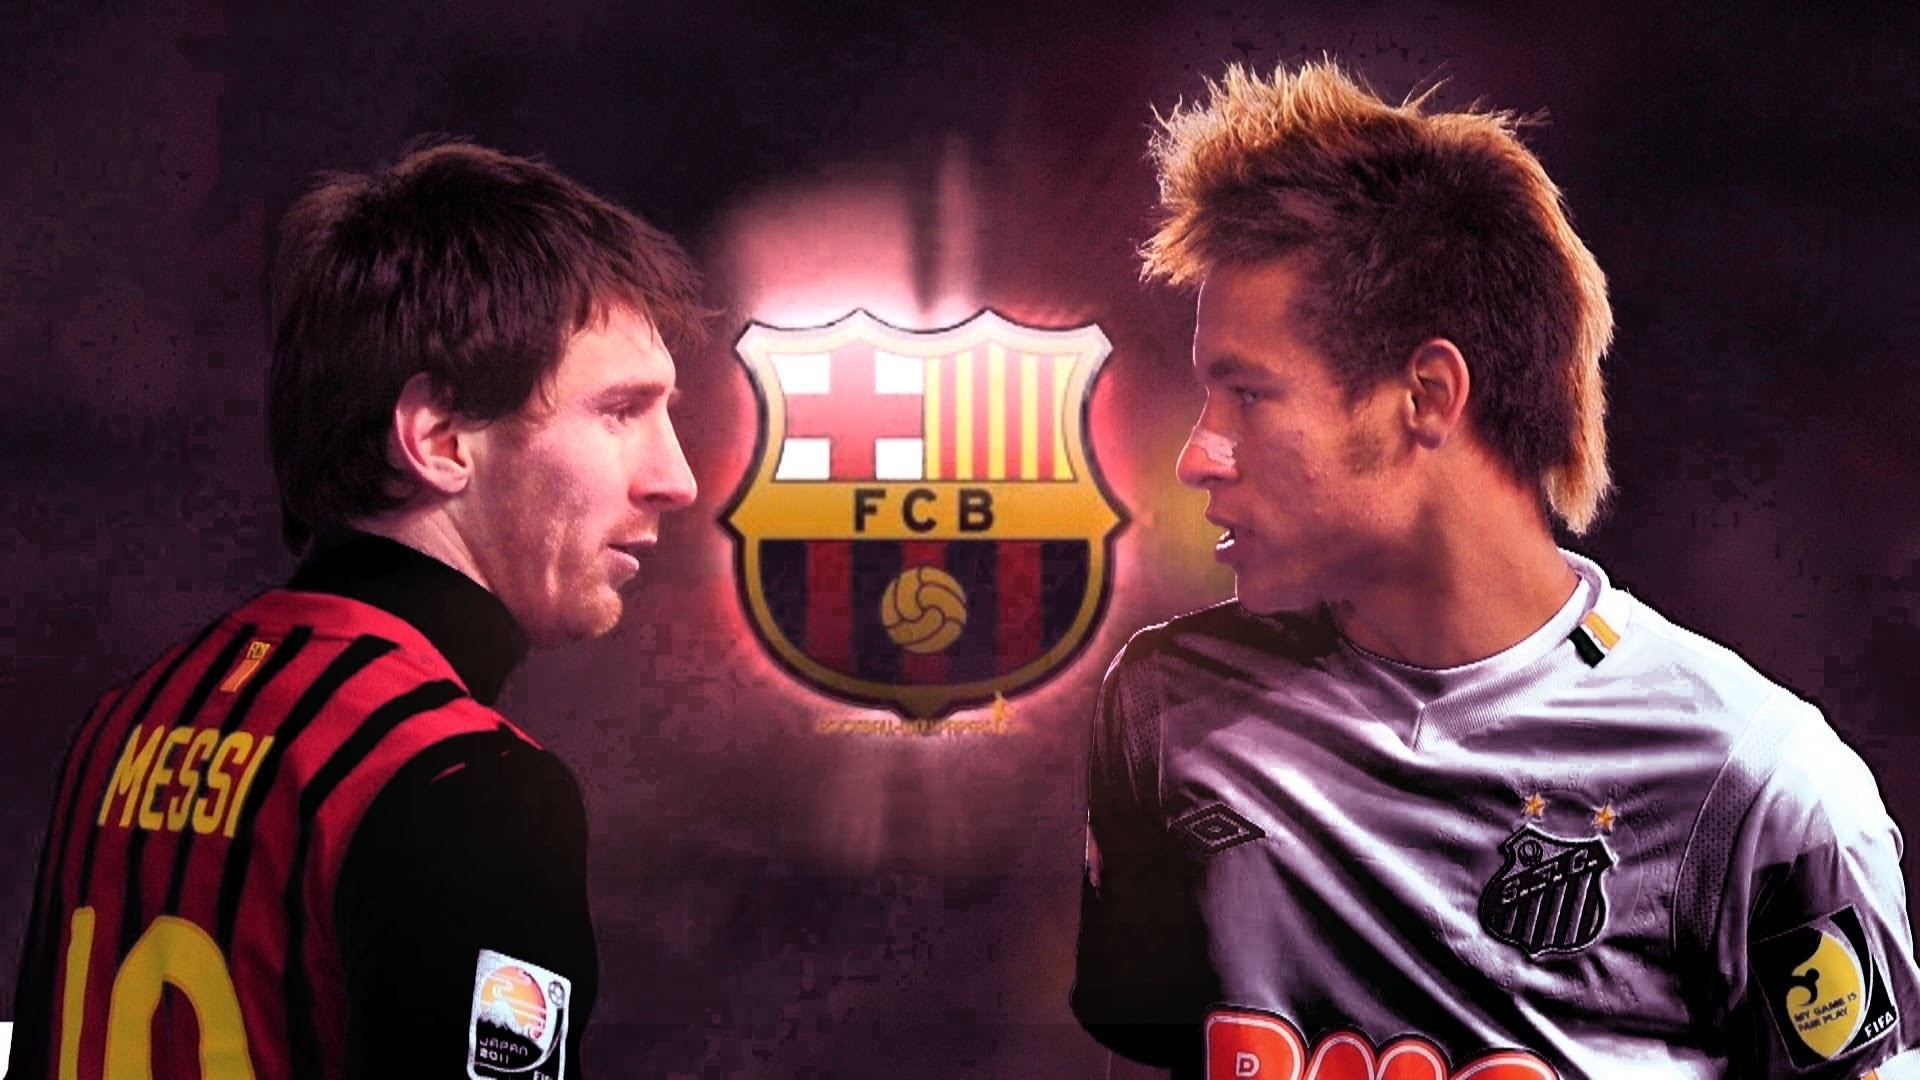 Neymar-and-Messi-HD-Wallpaper Messi And Neymar Wallpaper Hd